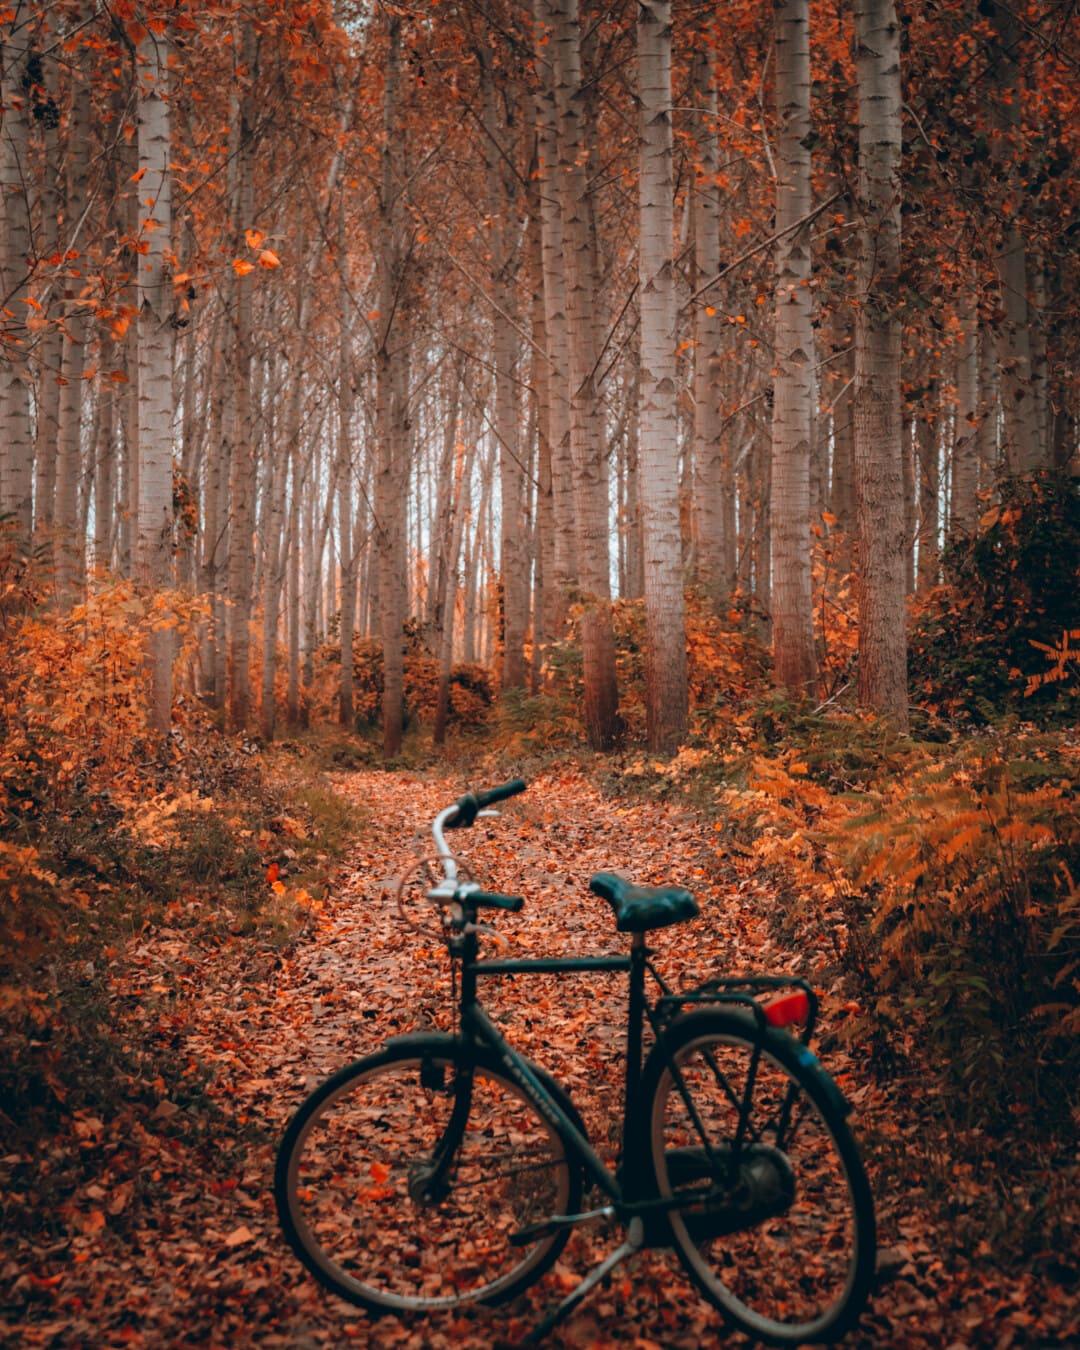 Waldweg, Herbstsaison, Fahrrad, Waldweg, Rad, Wald, Holz, Struktur, Fahrrad, Blatt